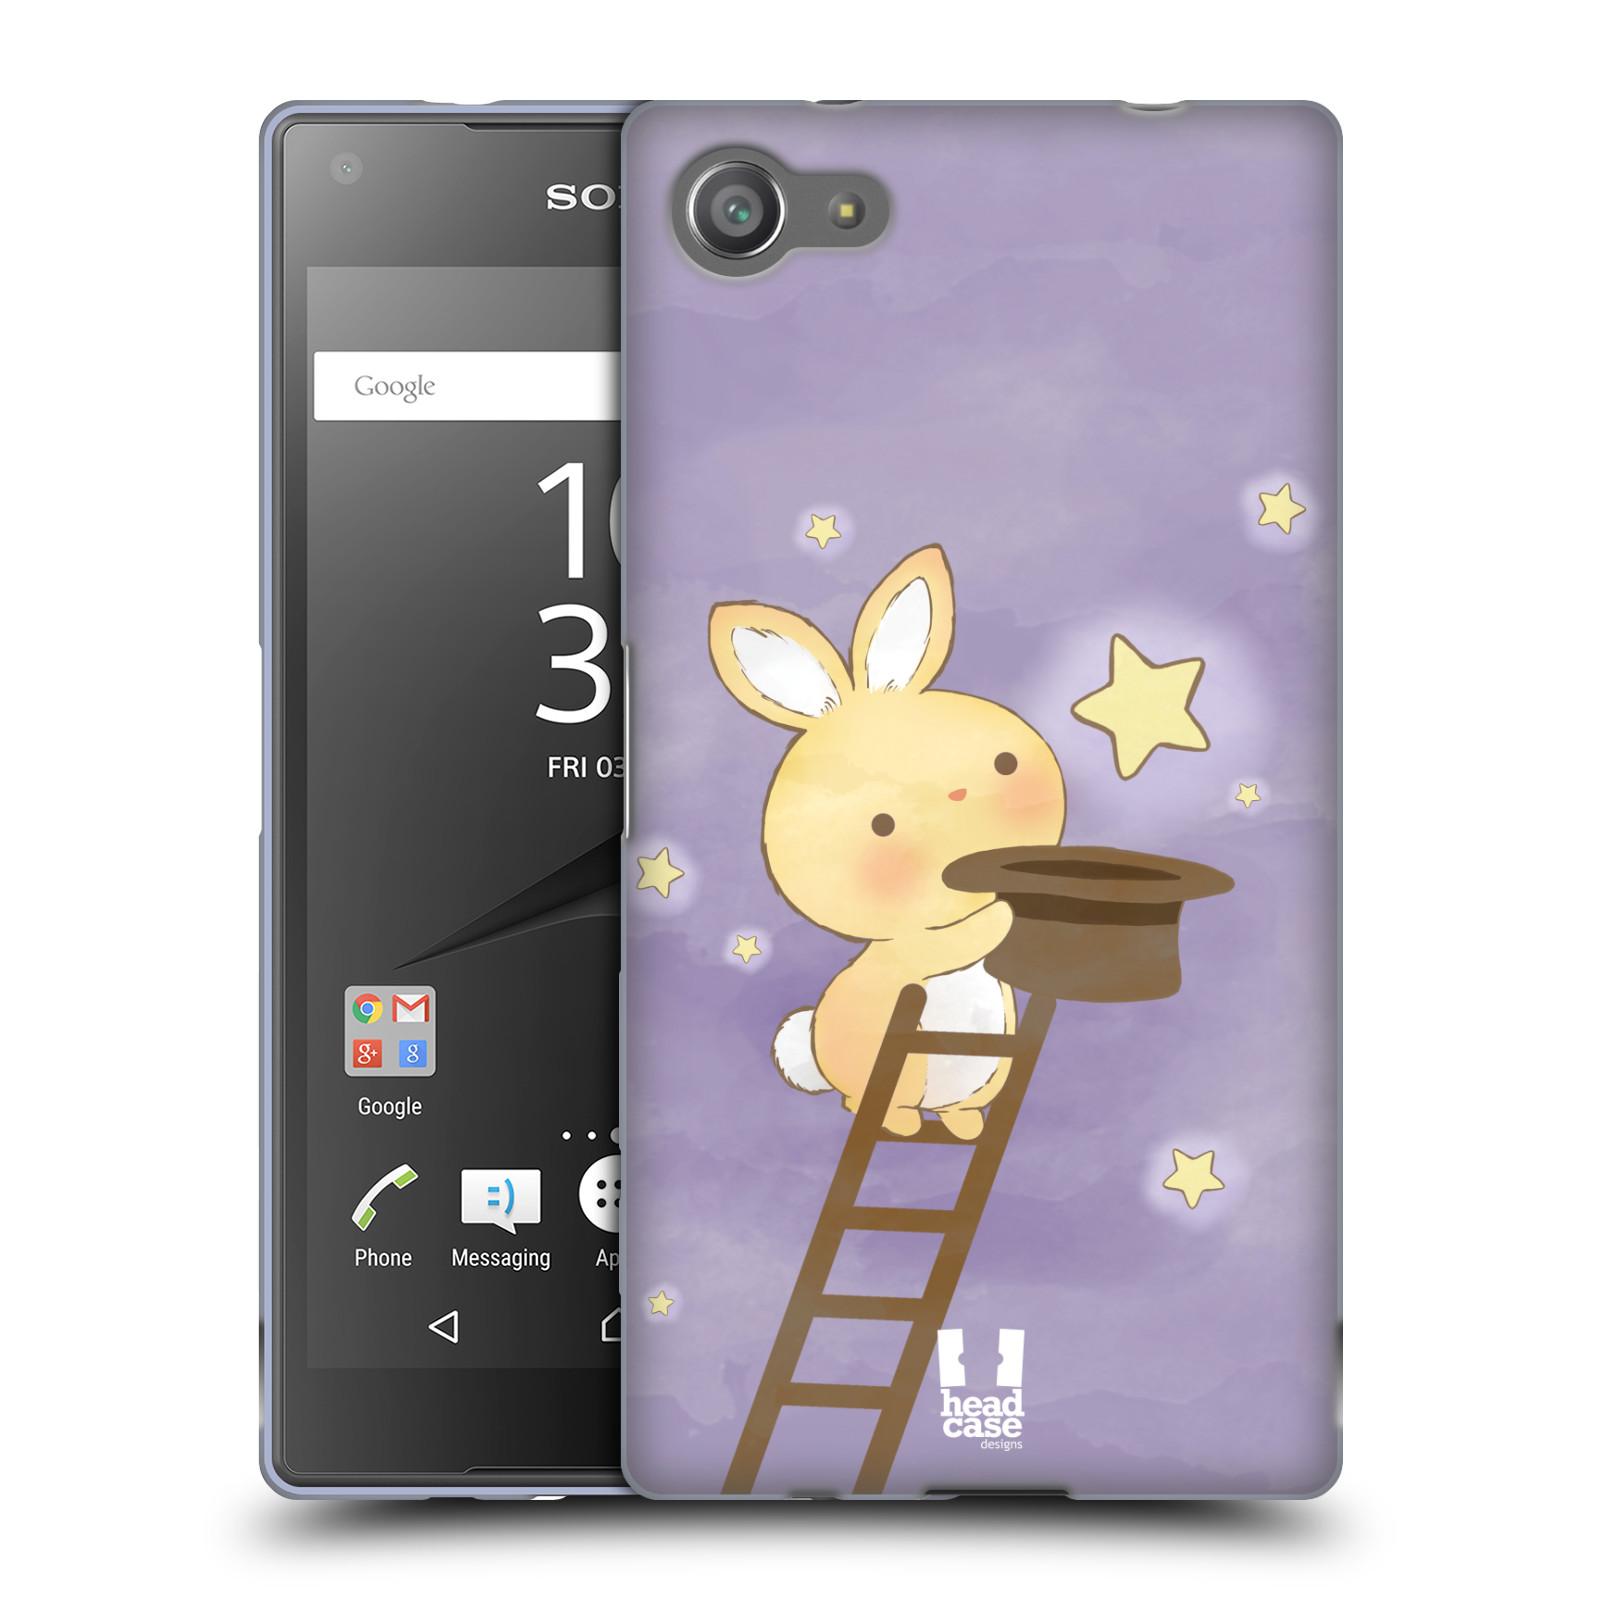 HEAD CASE silikonový obal na mobil Sony Xperia Z5 COMPACT vzor králíček a hvězdy fialová